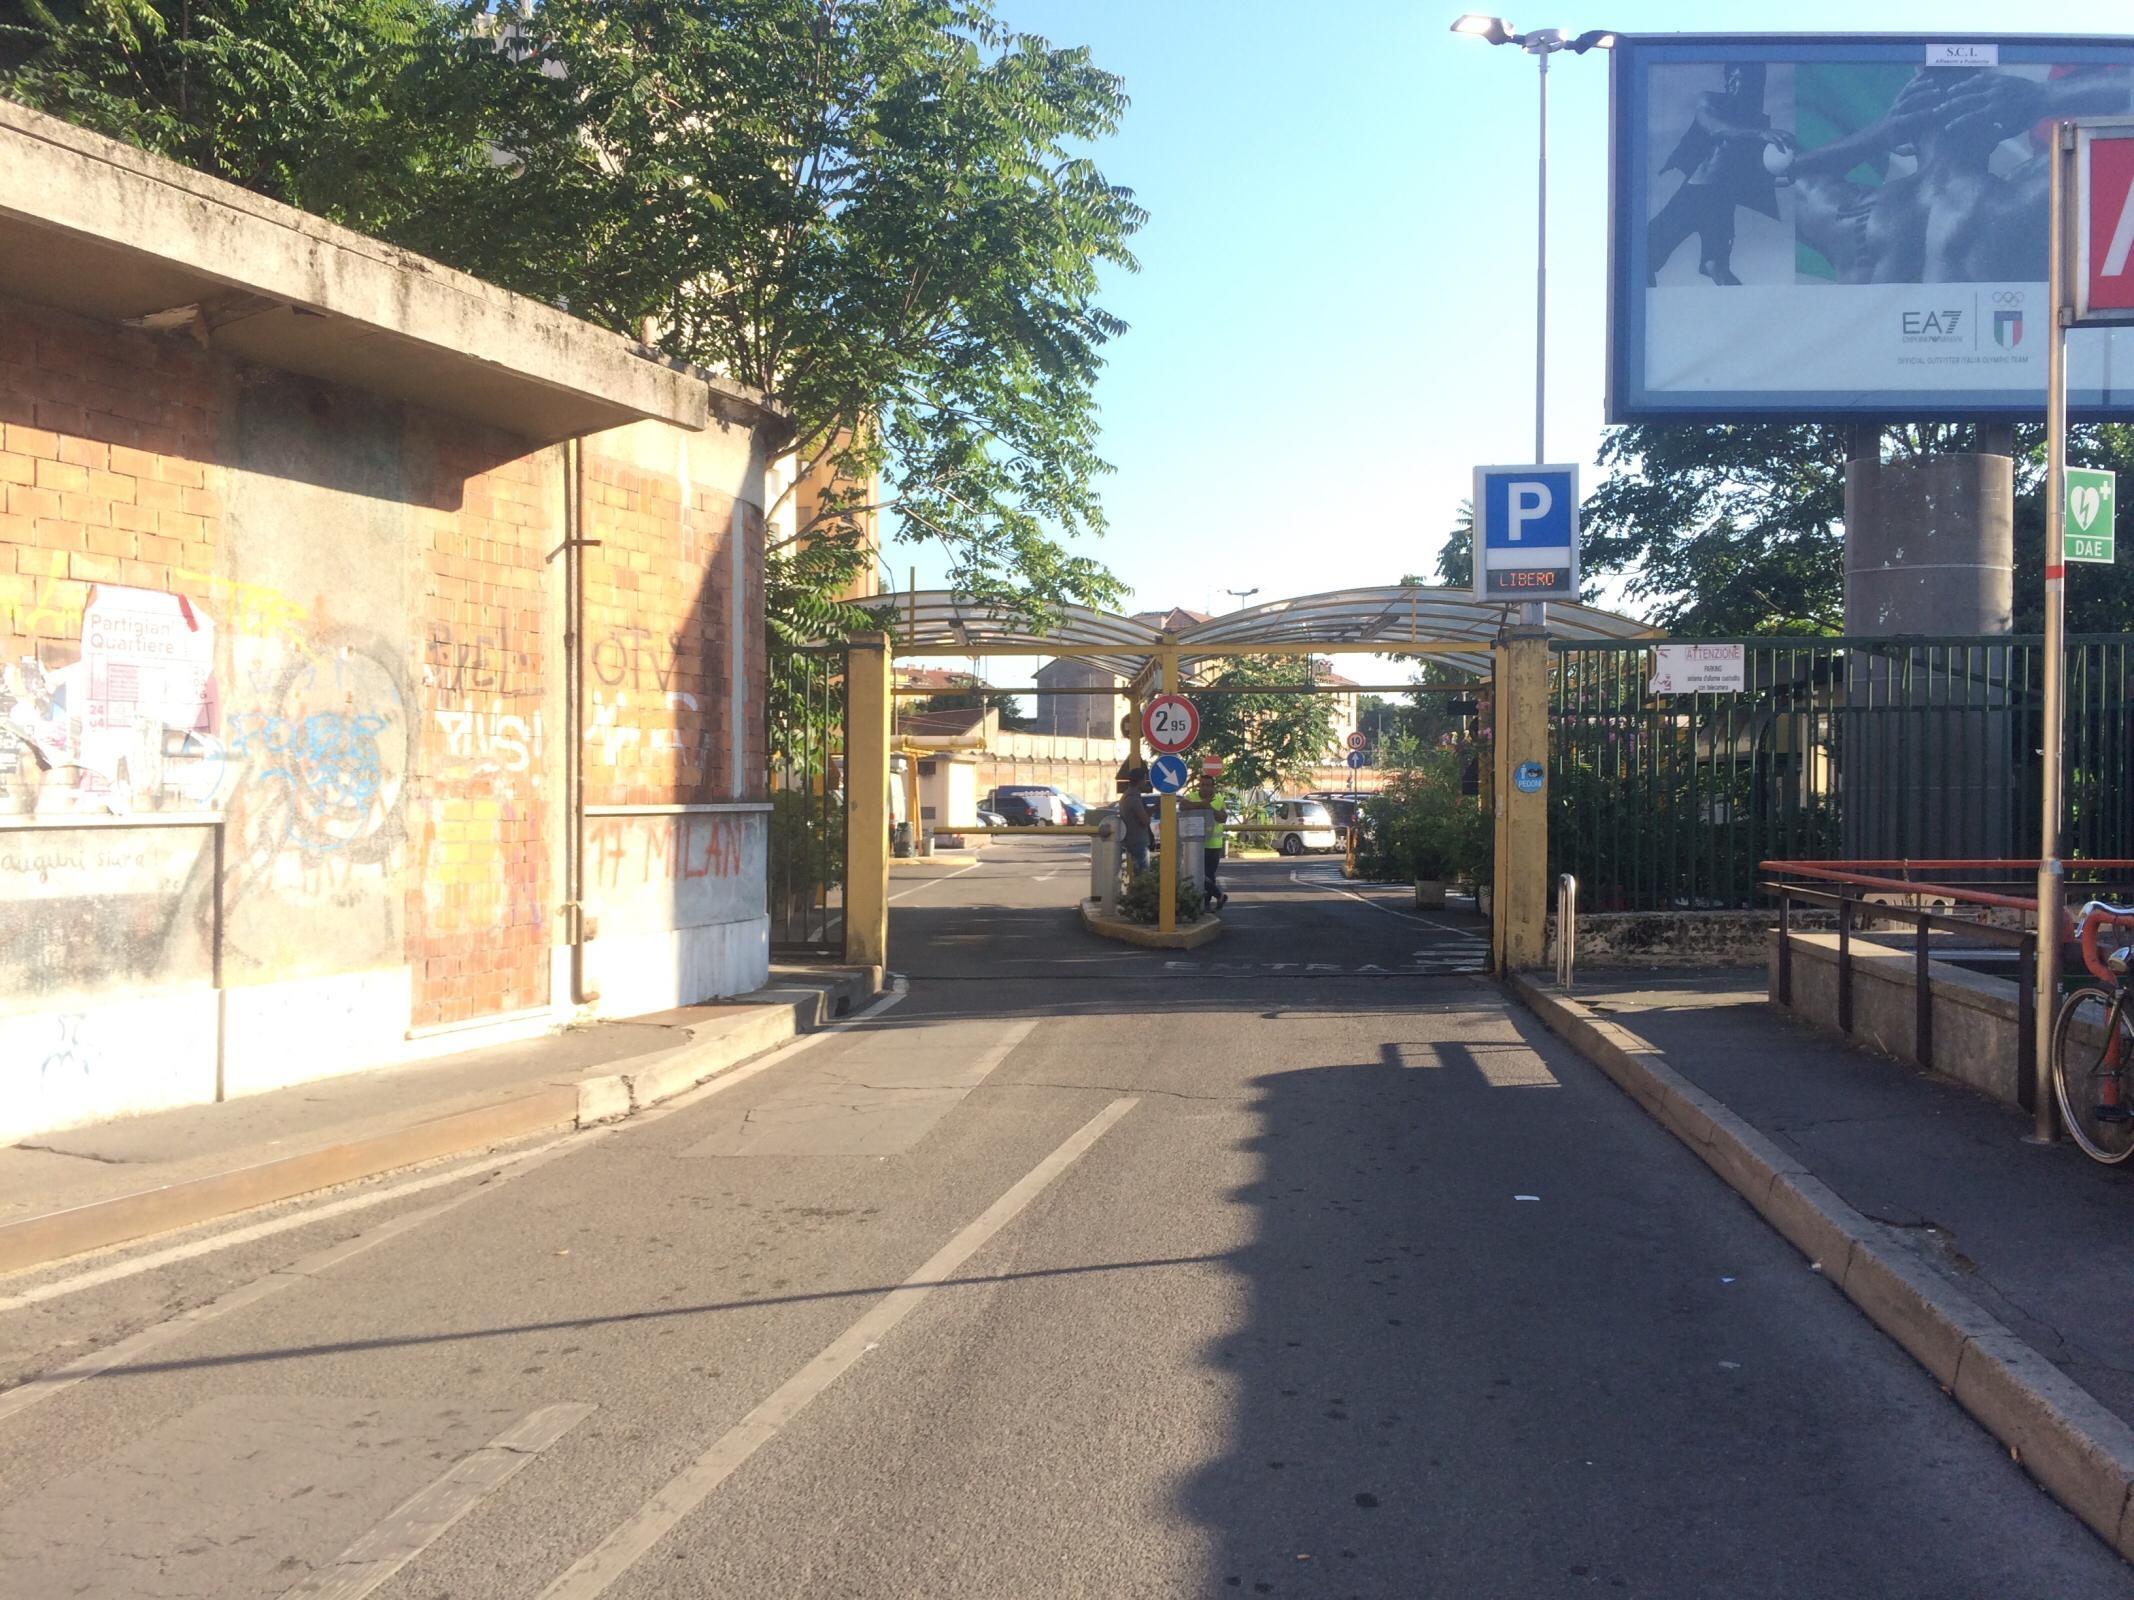 Parcheggio Milano Porta Genova Ii Parking In Milano Parkme